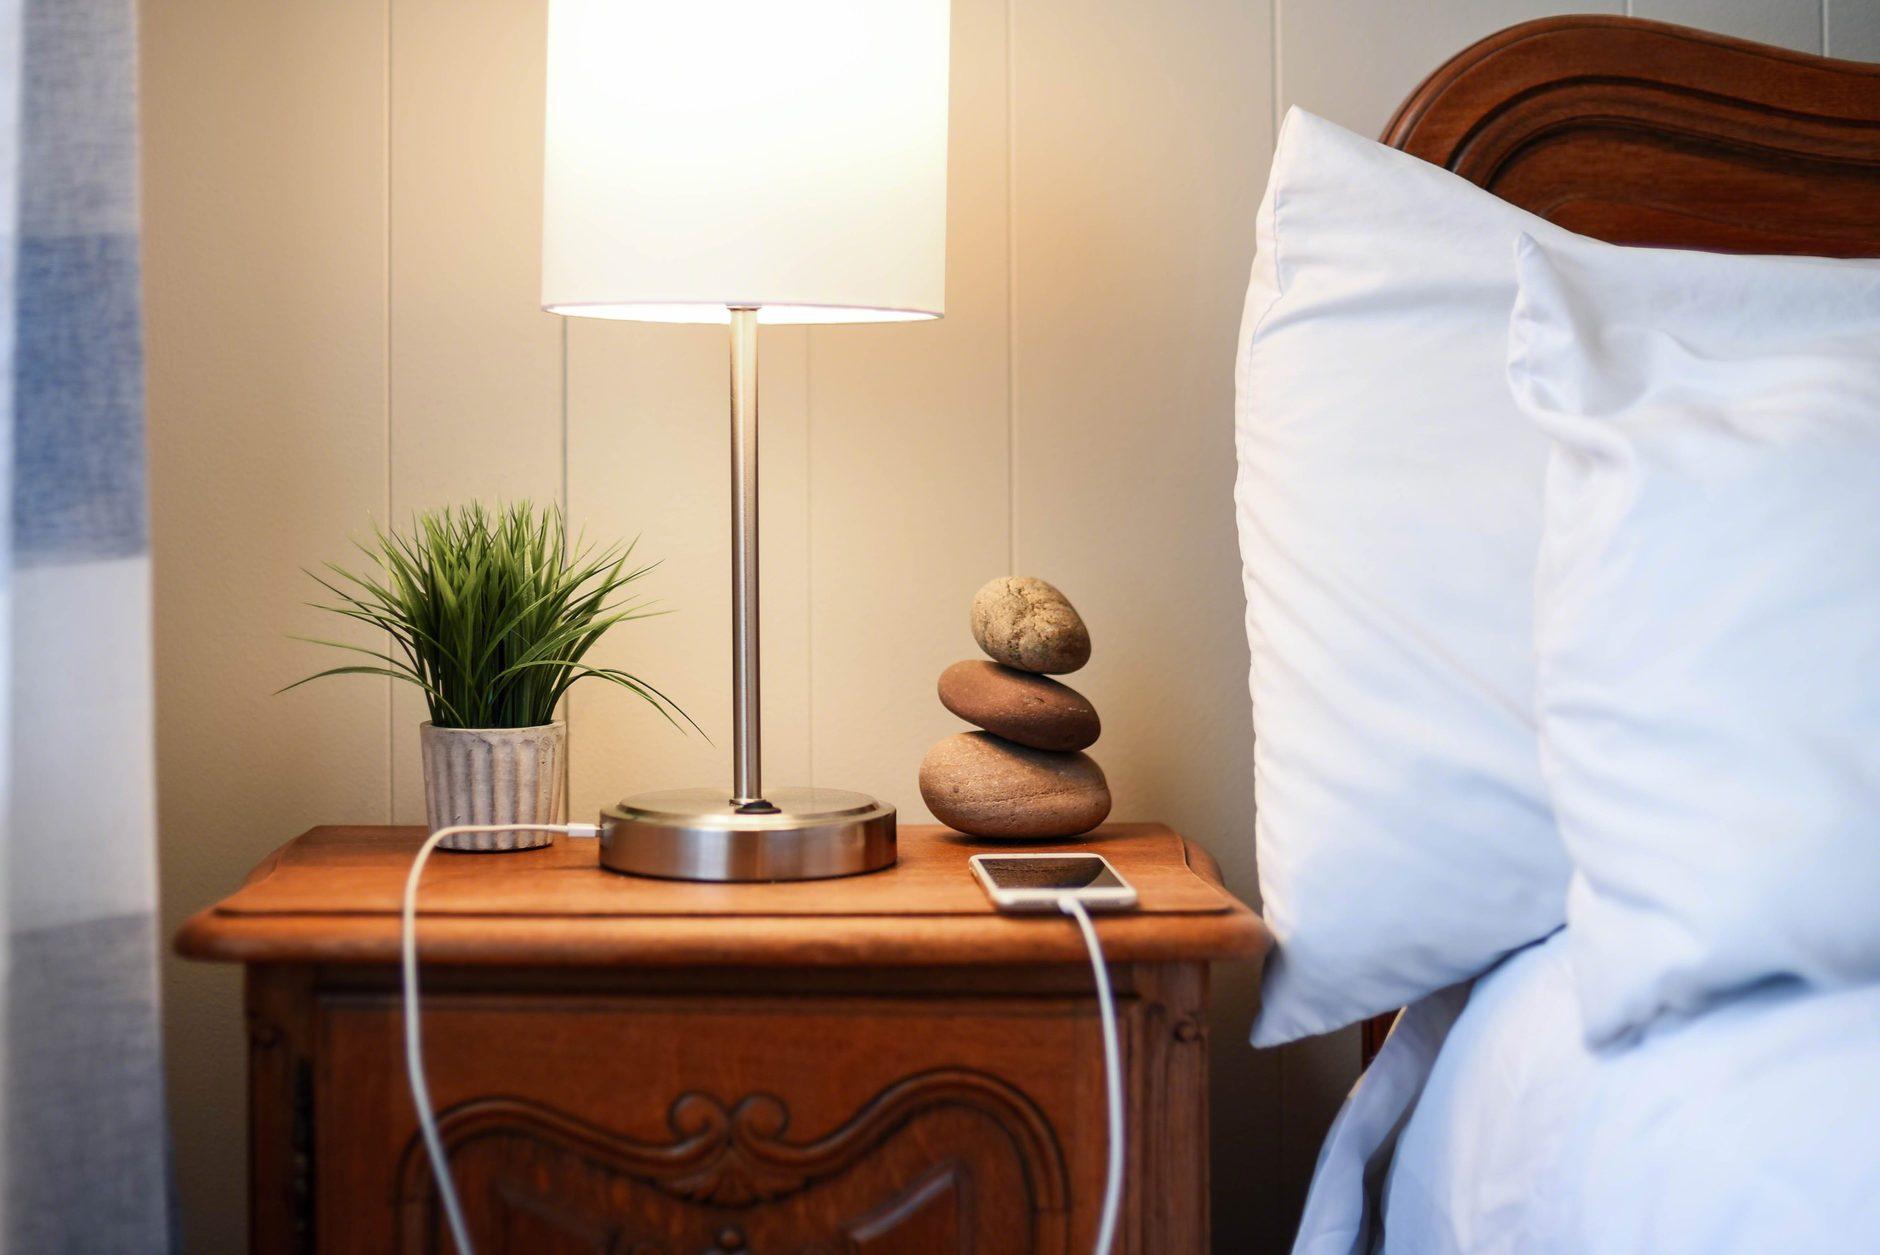 smarphone charging on nightstand next to bed